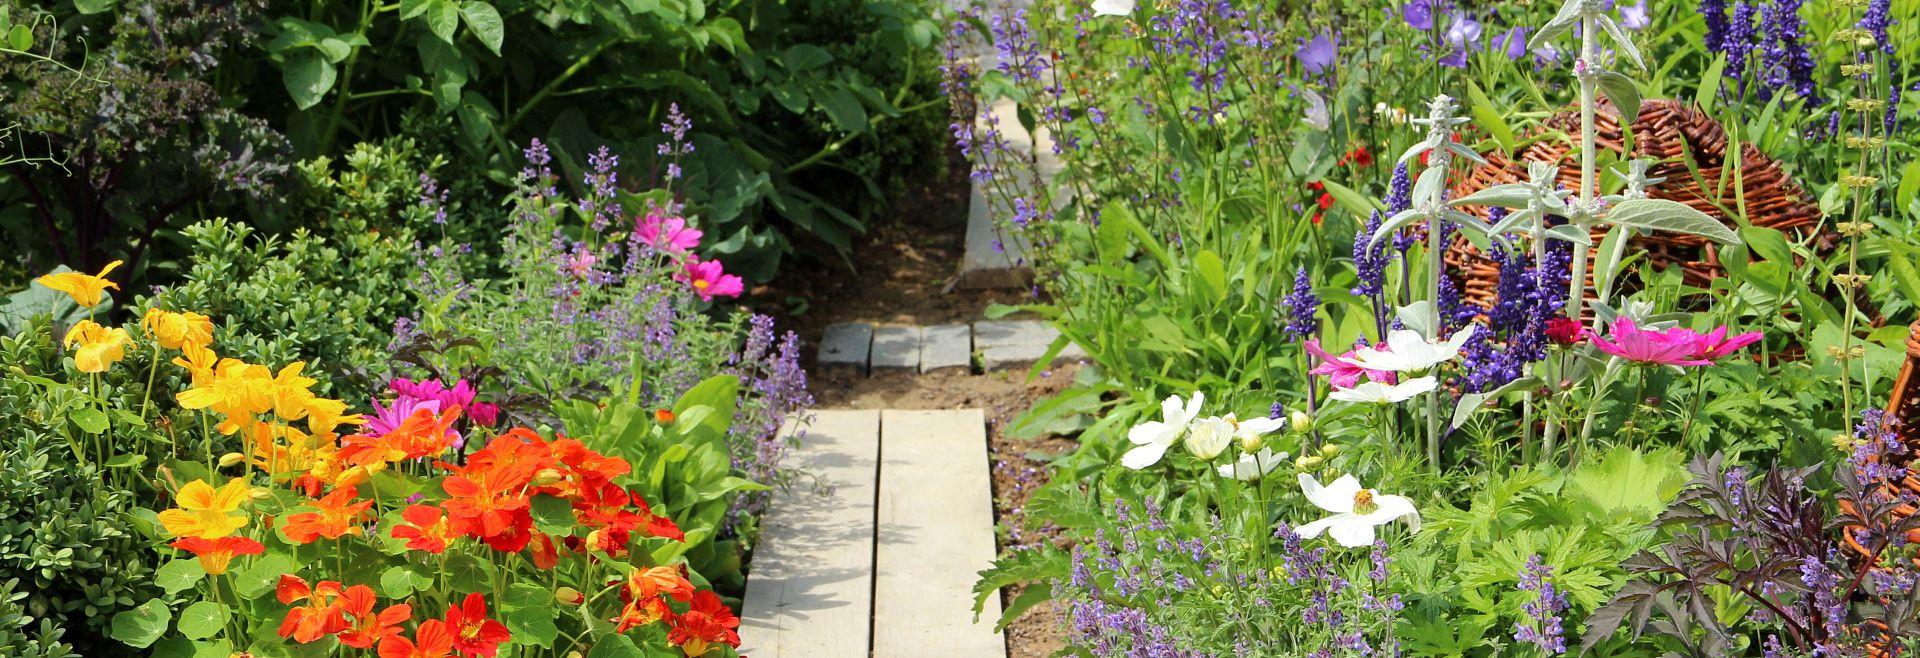 Herb Vegetables Flower Garden Getty Images